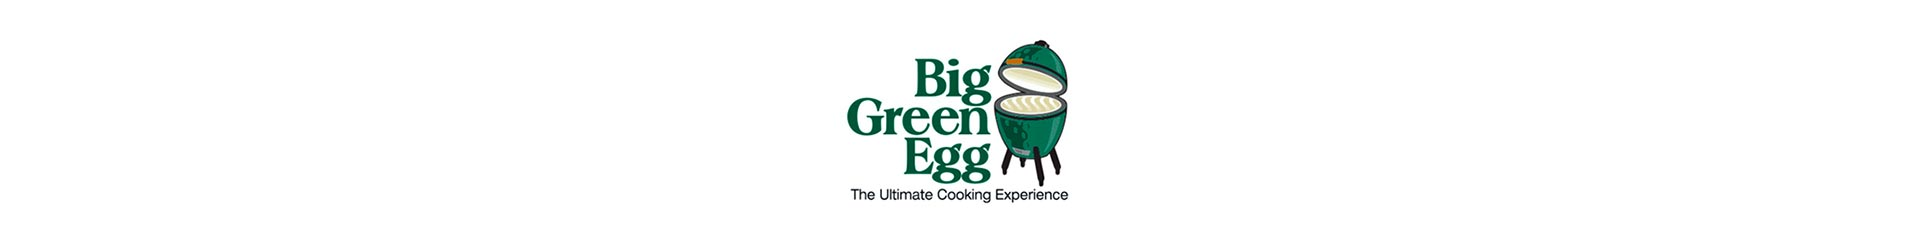 Big-Green-Egg-Banner